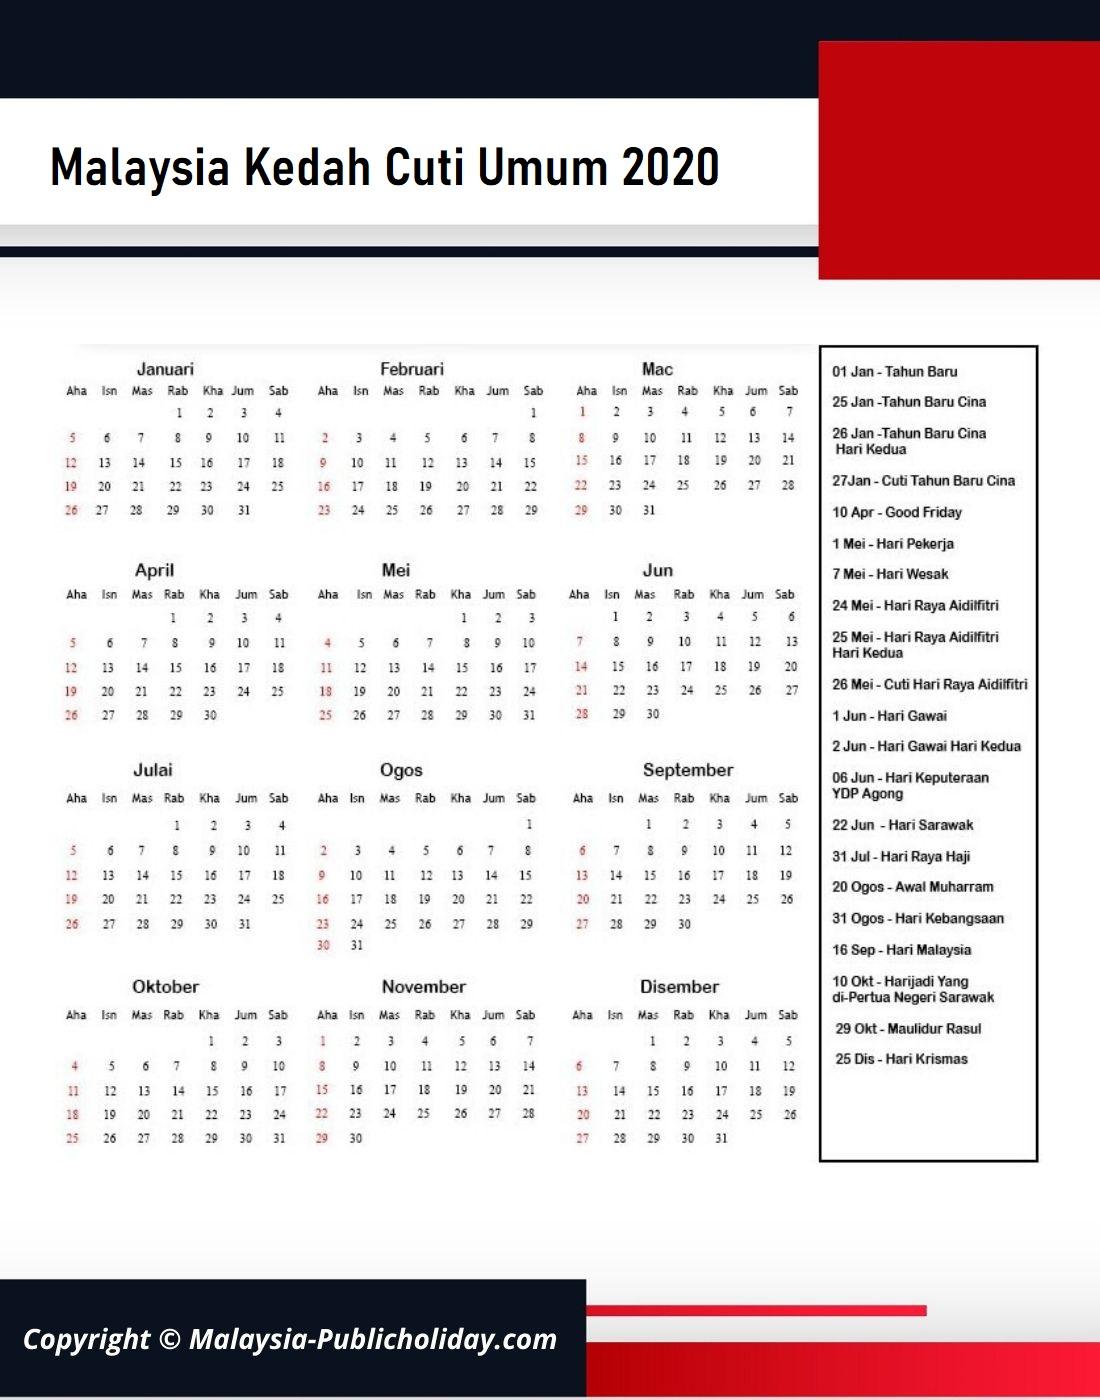 Cuti Umum Kedah 2020 Malaysia